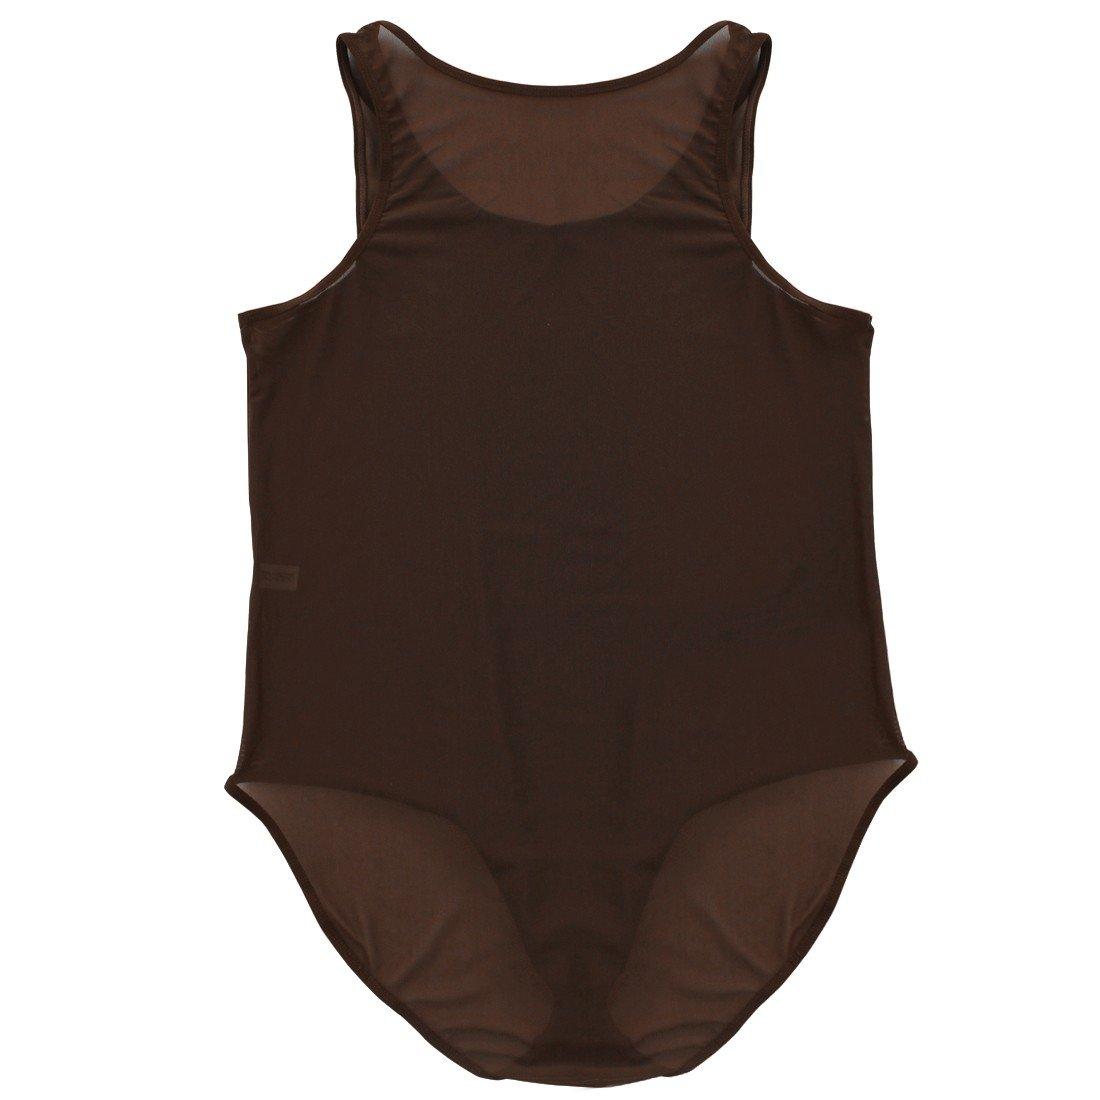 003992dd8e MSemis Men's Sexy See Through Sheer Mesh Leotard Bodysuit High Cut Thong  Vest Lingerie: Amazon.co.uk: Clothing